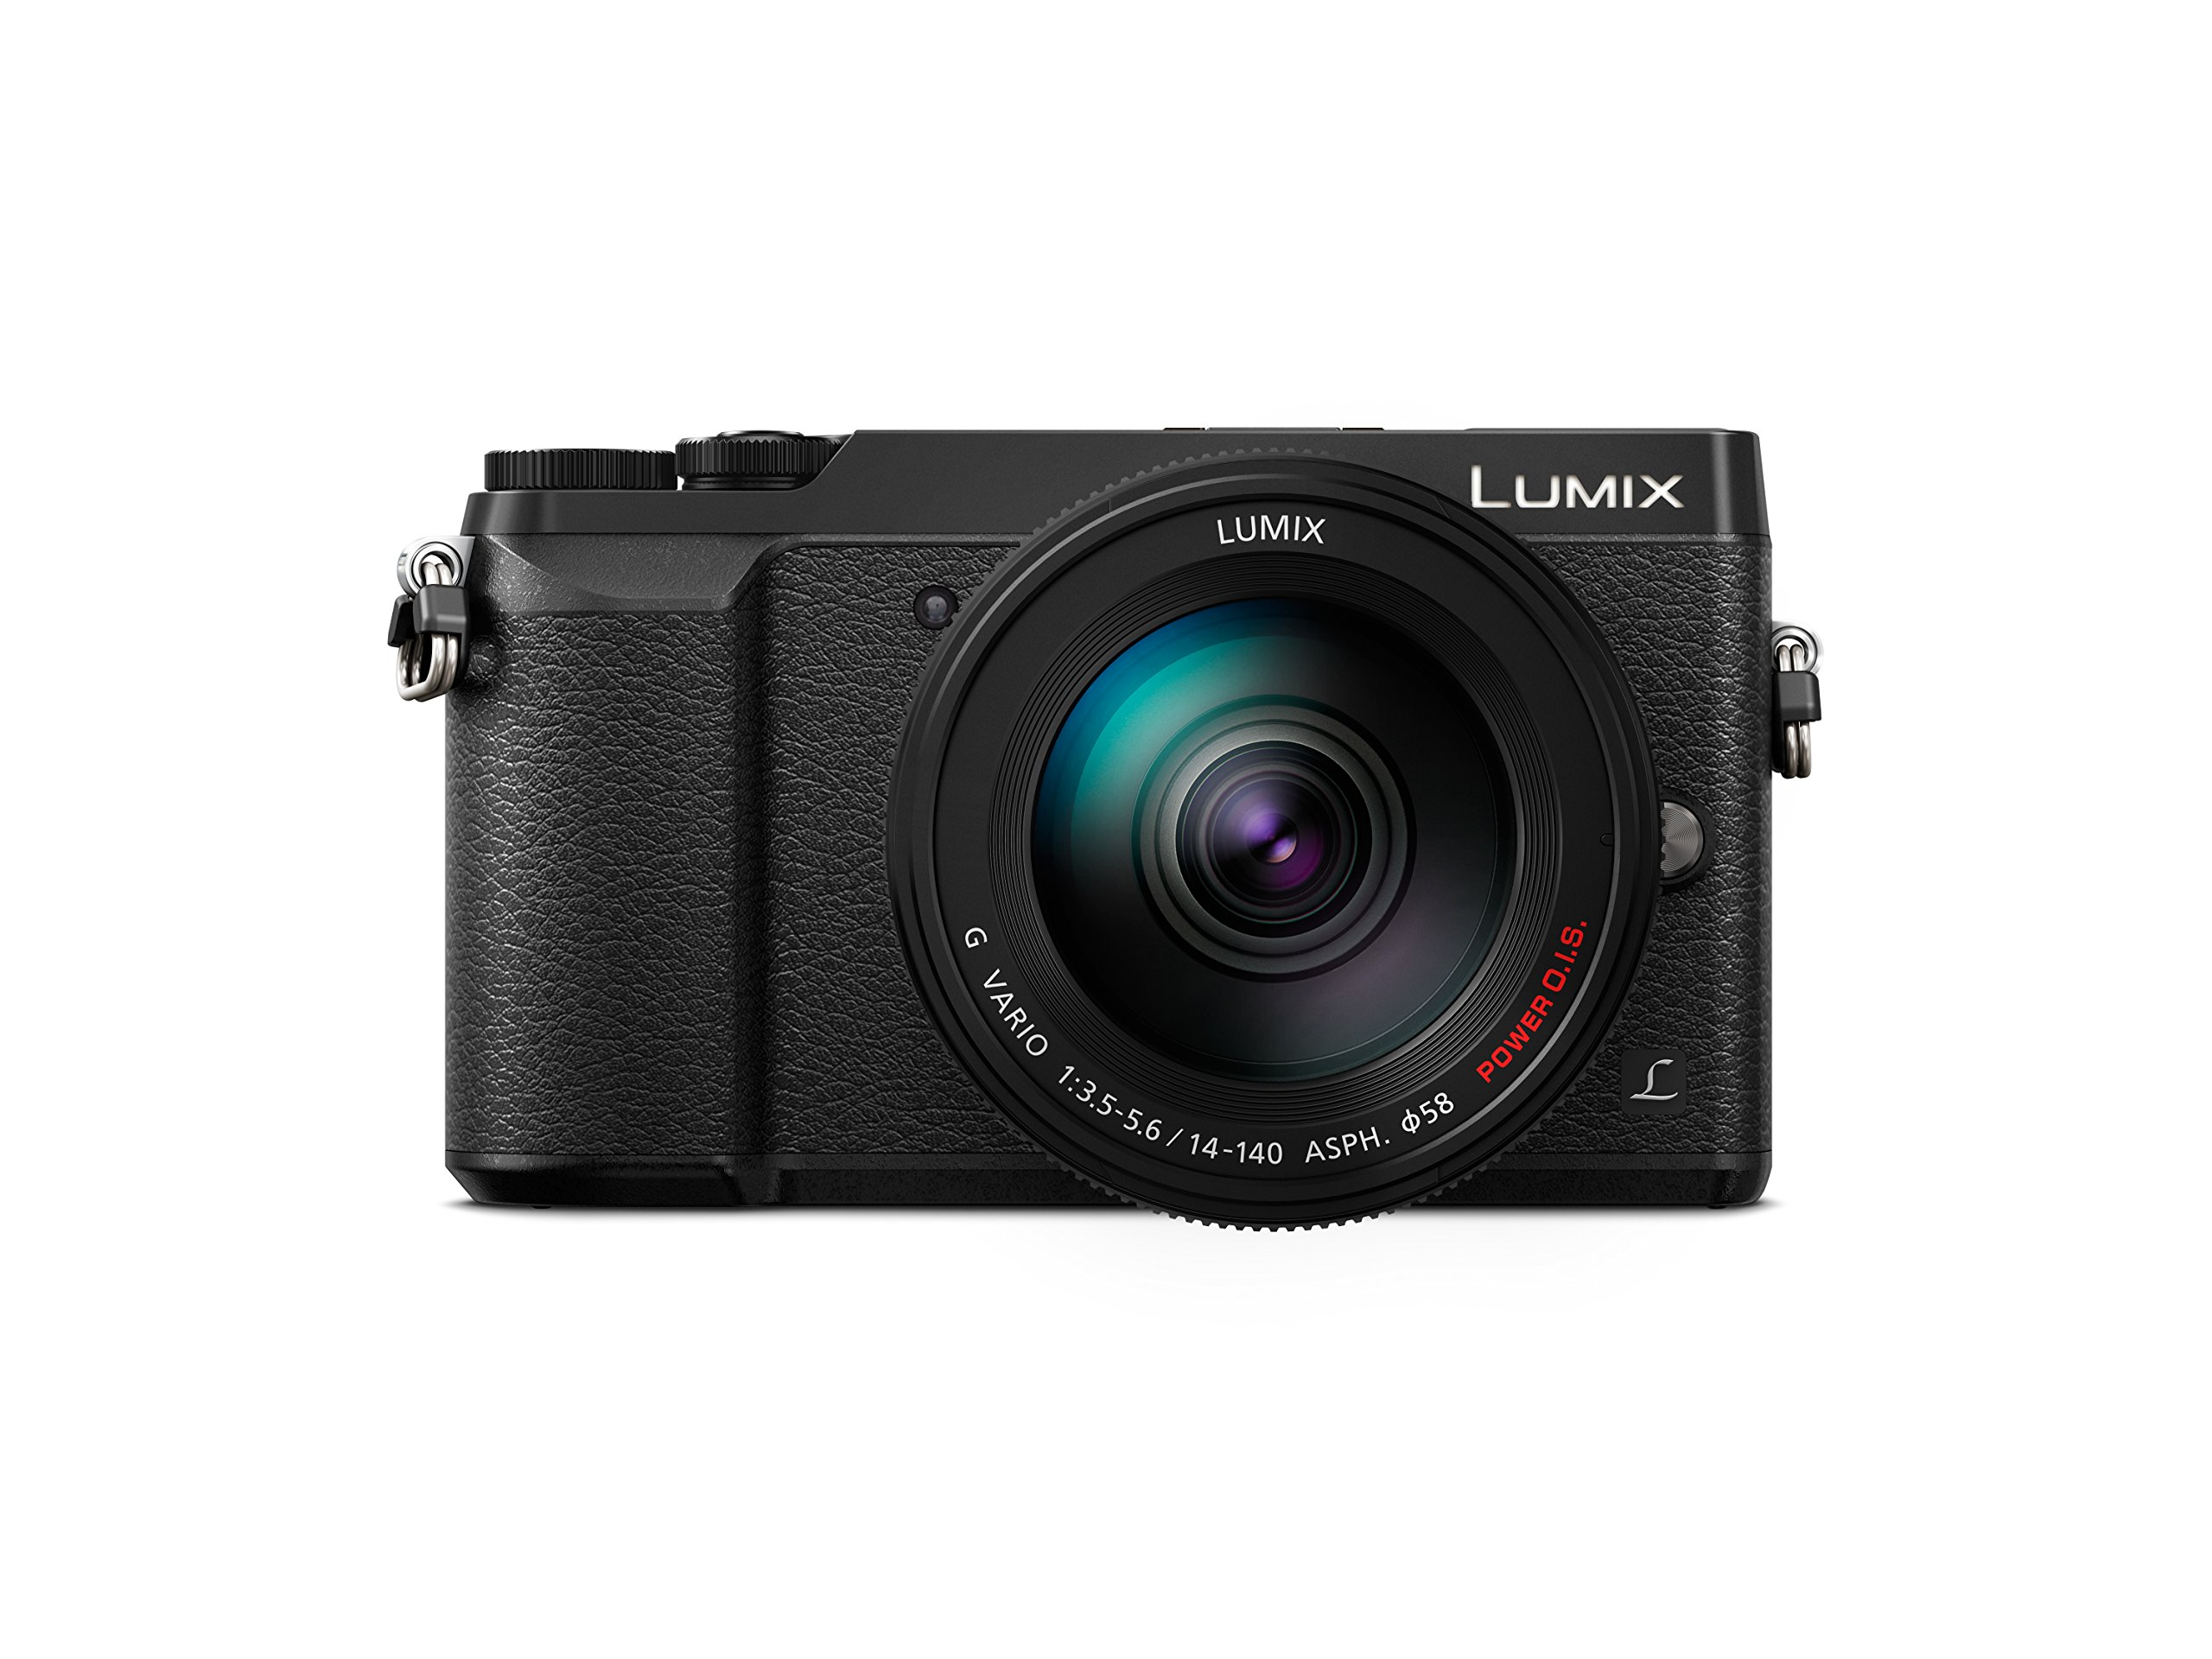 Panasonic Lumix DMC-GX80HEGK Kit Fotocamera Mirrorless GX80 e Obiettivo 14-140mm, 16MP, Post Focus, 4K Photo & 4K Video, Nero product image